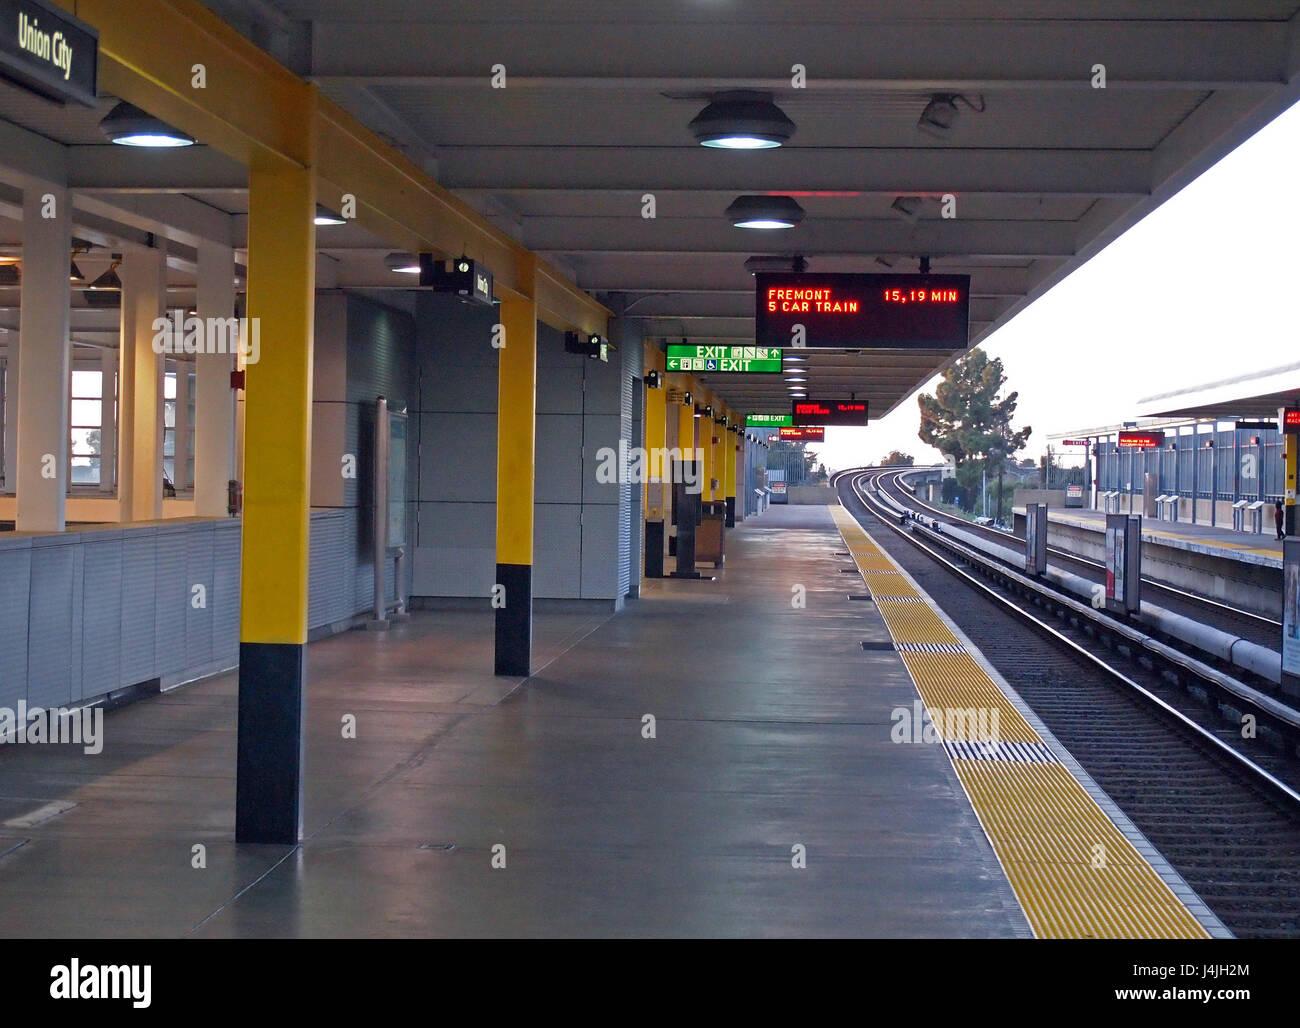 BART, Bay Area Rapid Transit, Union City station boarding platform San Francisco Bay area, California, USA - Stock Image